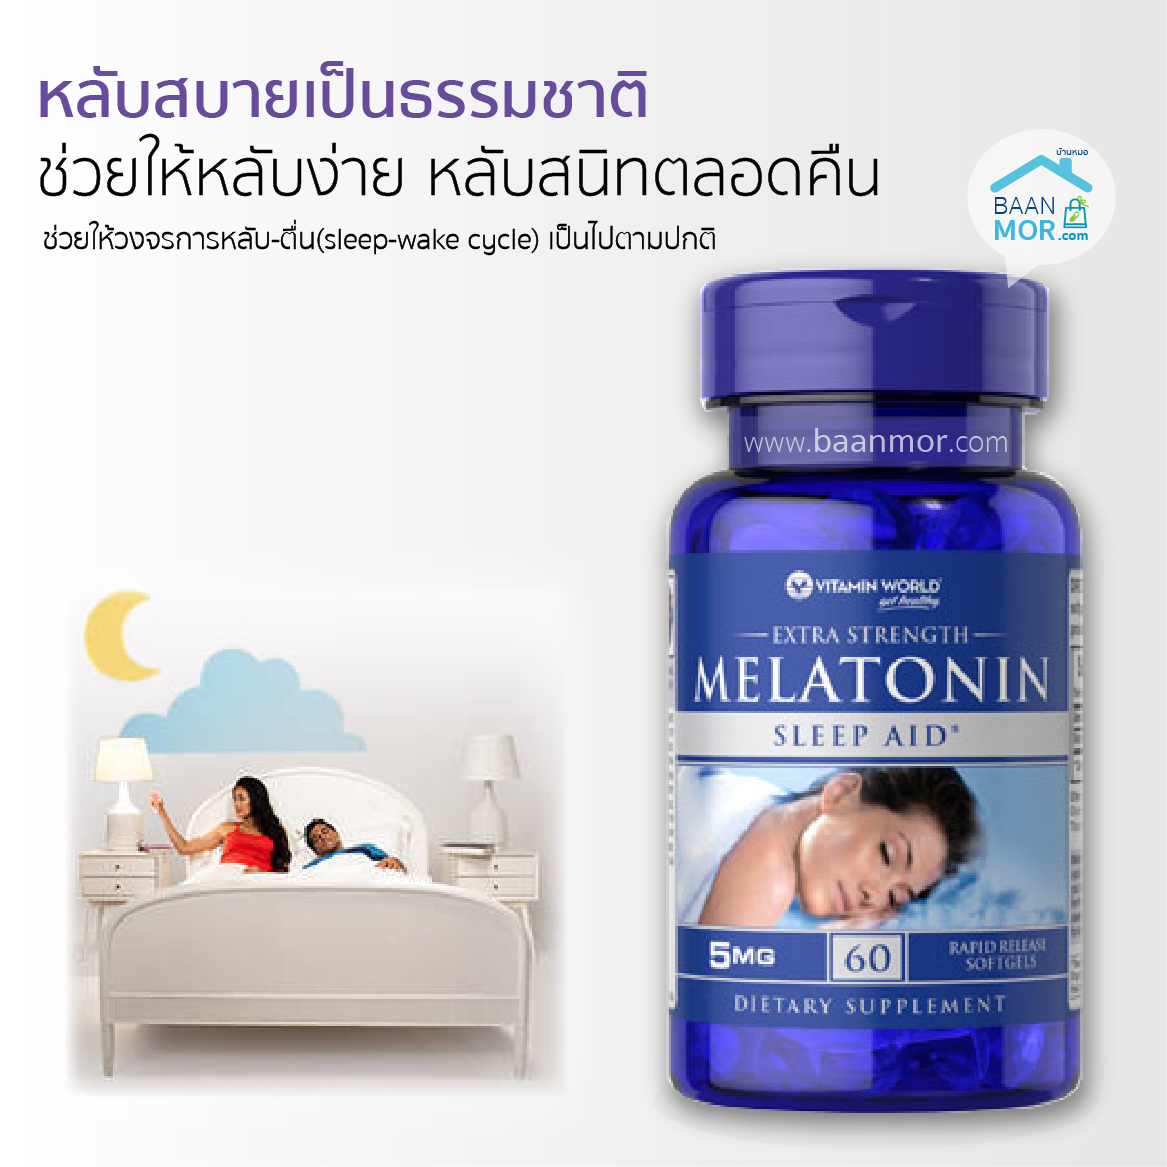 Vitamin World, Melatonin 5 mg เมลาโตนิน ช่วยแก้ปัญหานอนไม่หลับ ช่วยให้หลับง่ายขึ้น หลับสนิทตลอดคืน 5 มก 60 เม็ด